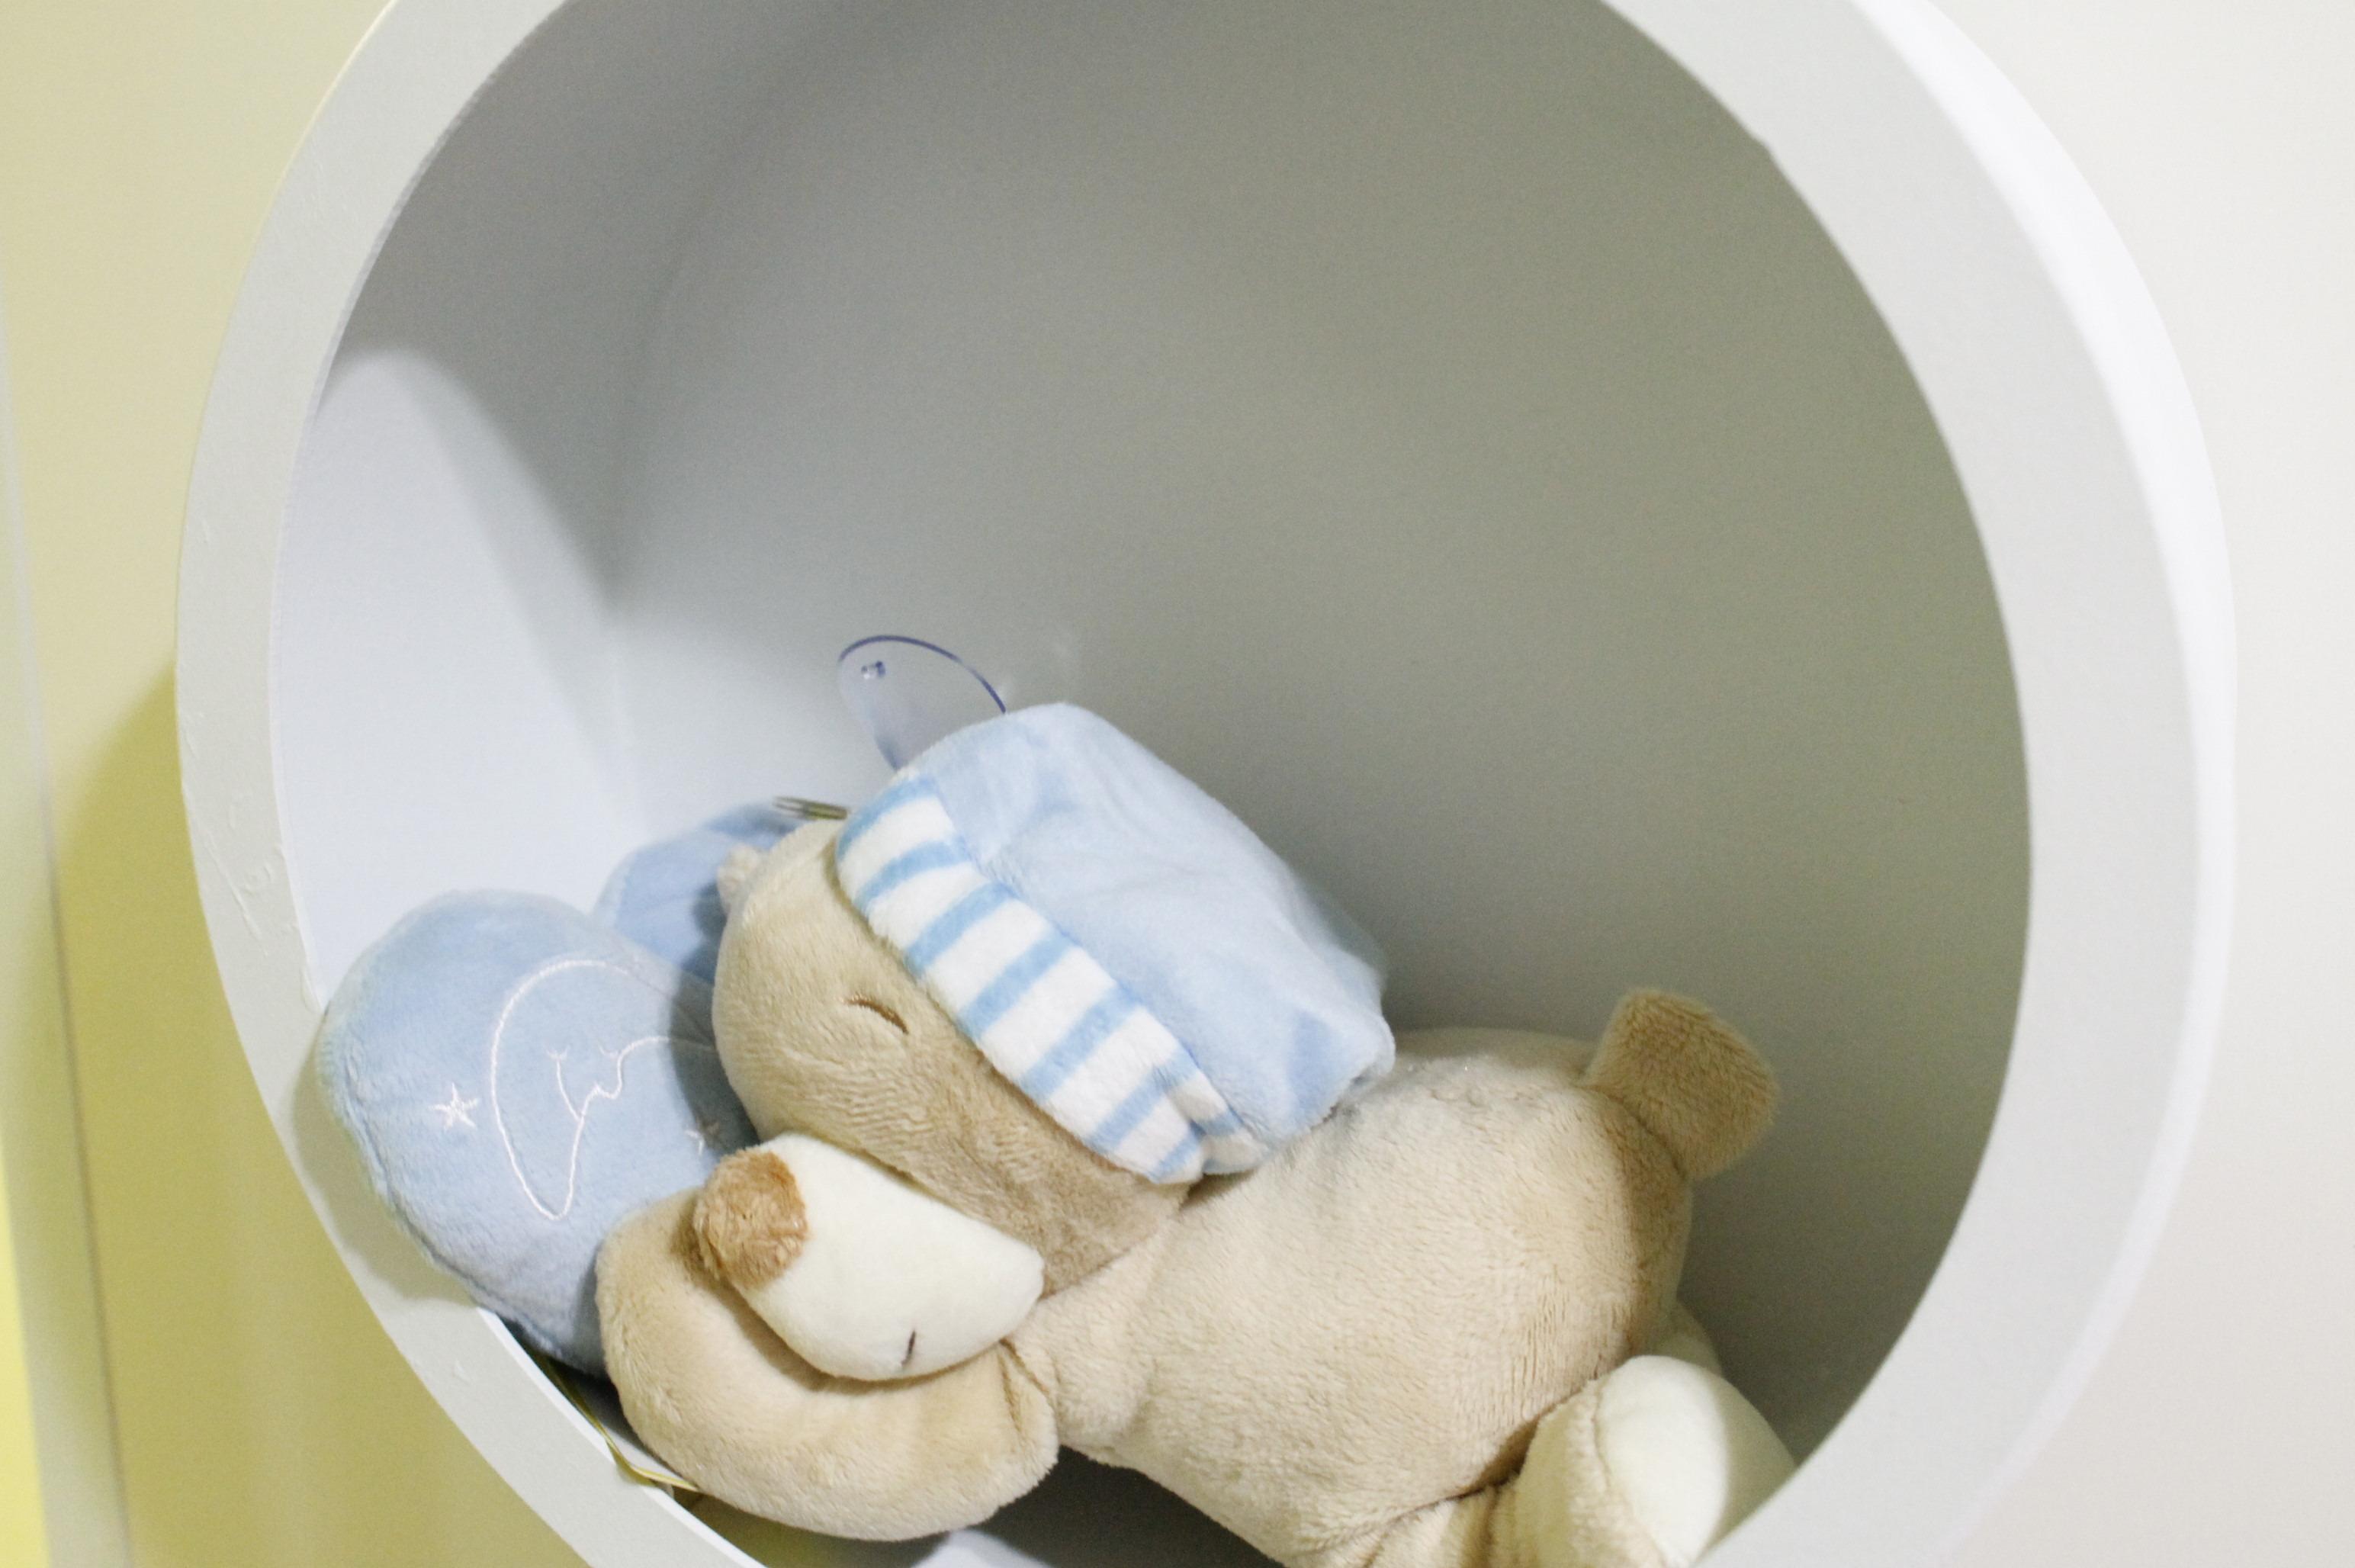 Os Nicho De Bebe ~ Nicho Redondo pra quarto de beb u00ea Liliarte Elo7